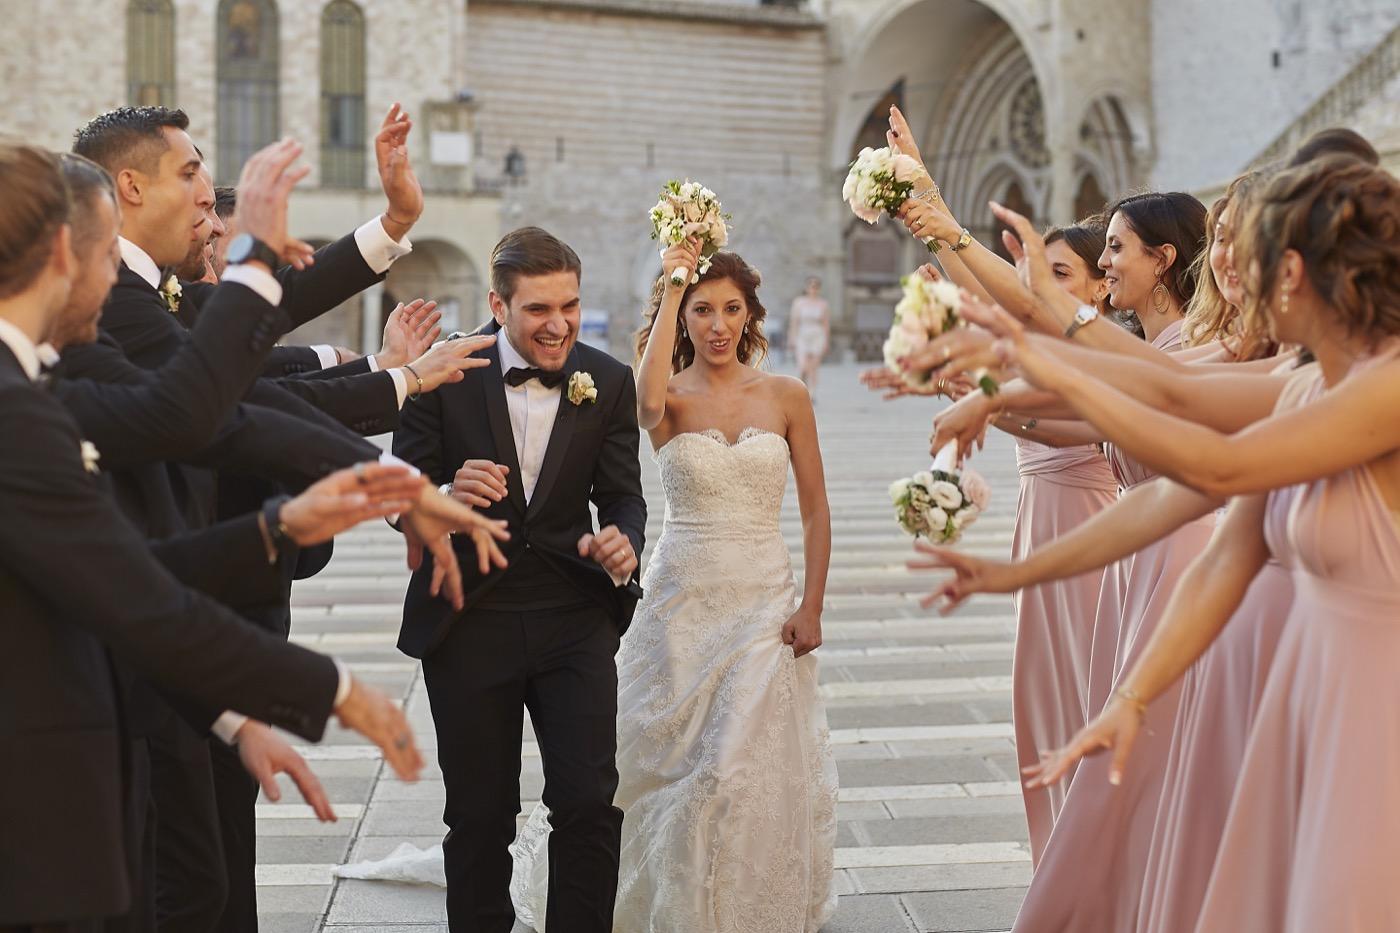 Claudio-Coppola-wedding-photographer-abbazia-7-frati-piegaro-76